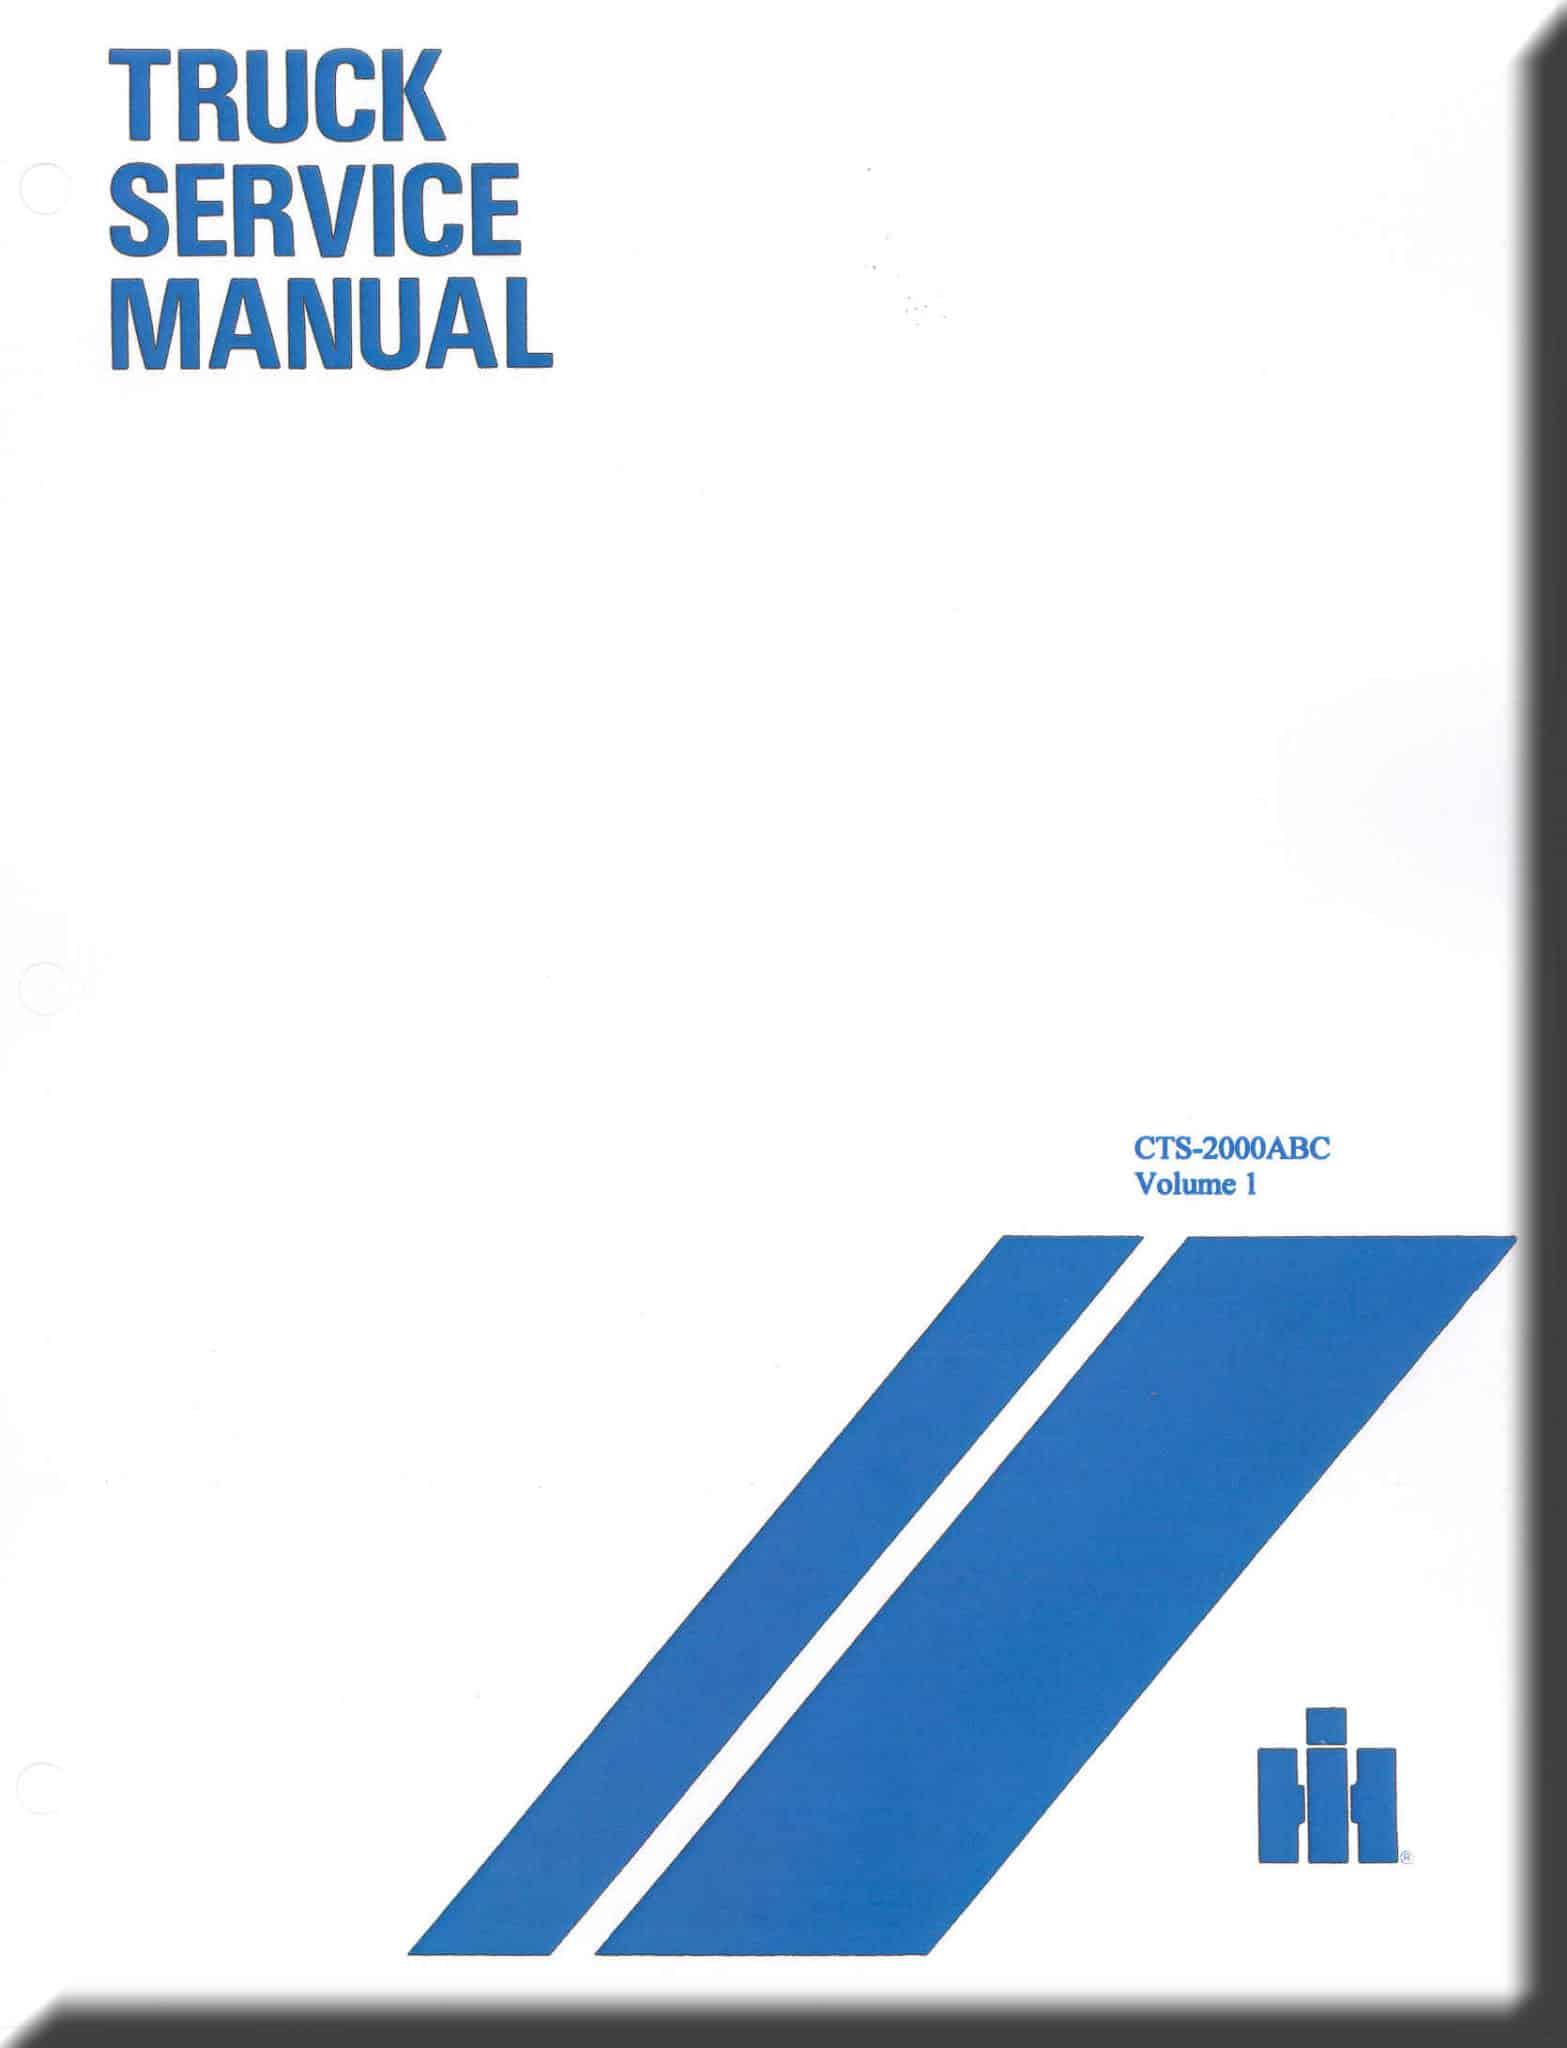 Old International Truck Service Manuals Parts 1954 Trucks Wiring Diagram Manual Abc 1958 1964